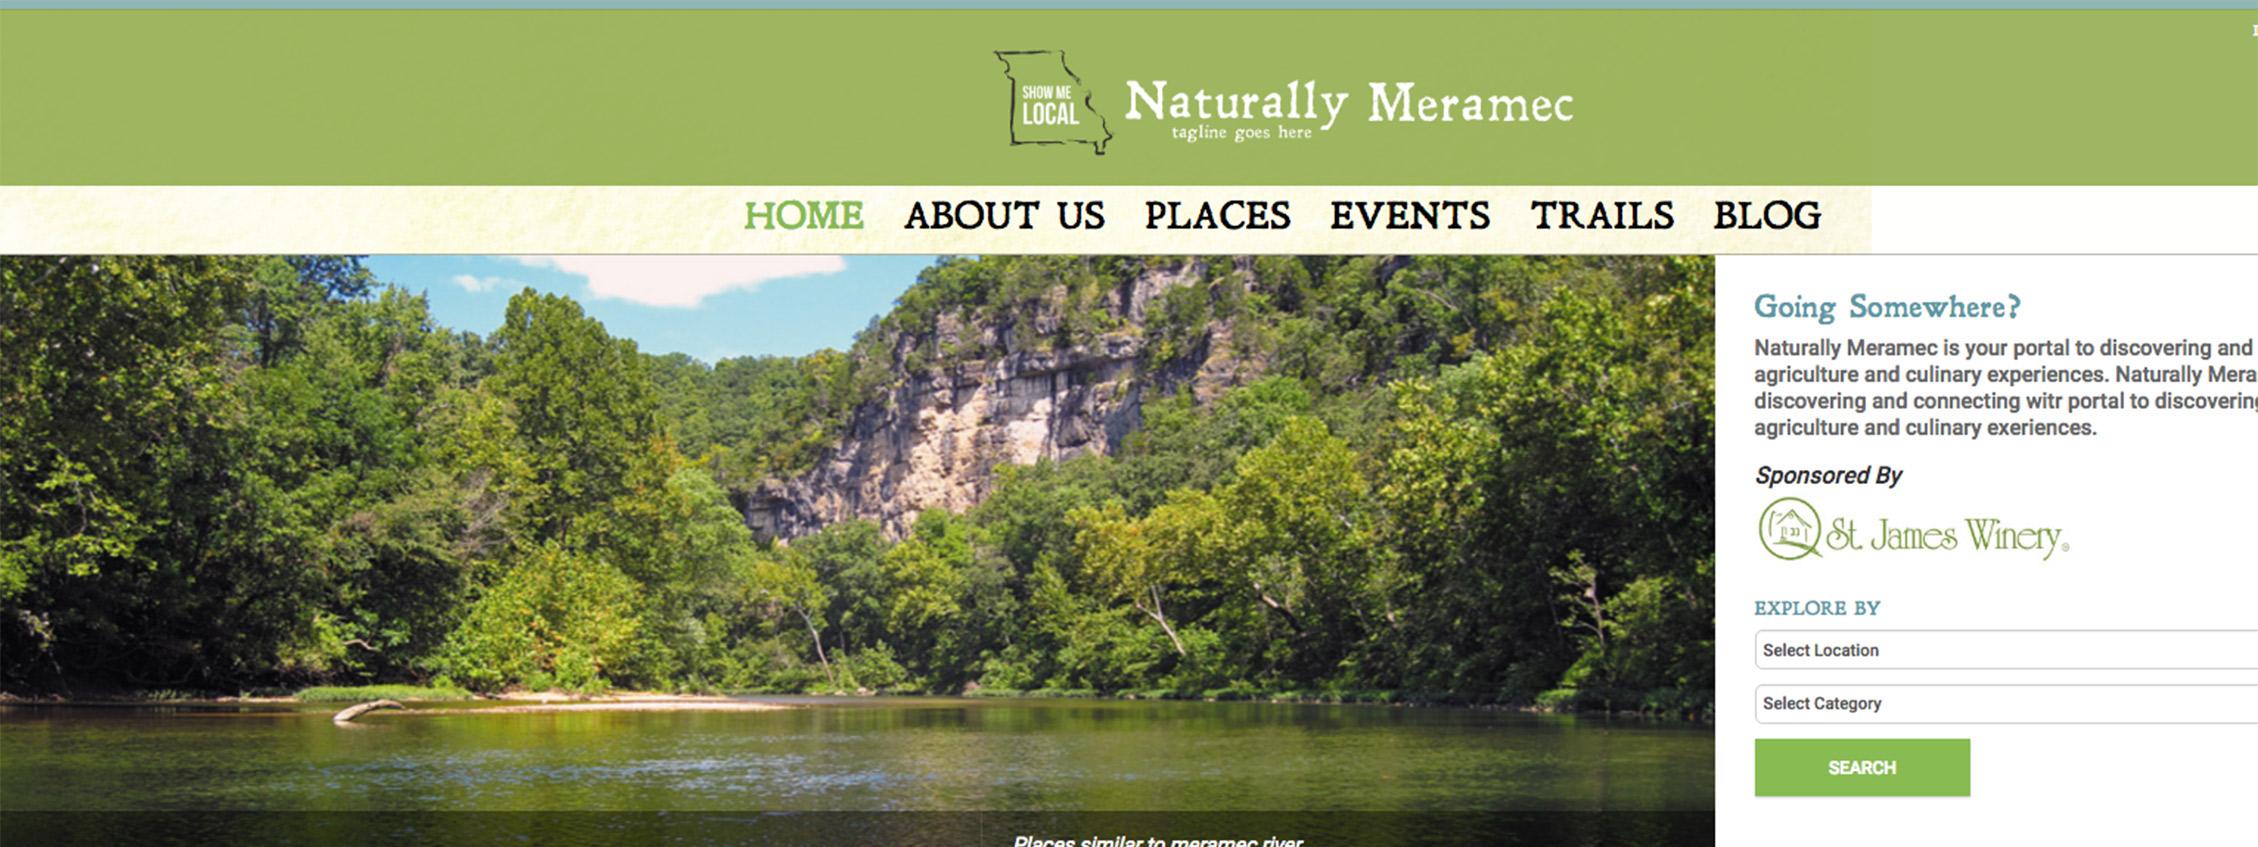 Naturally Meramec